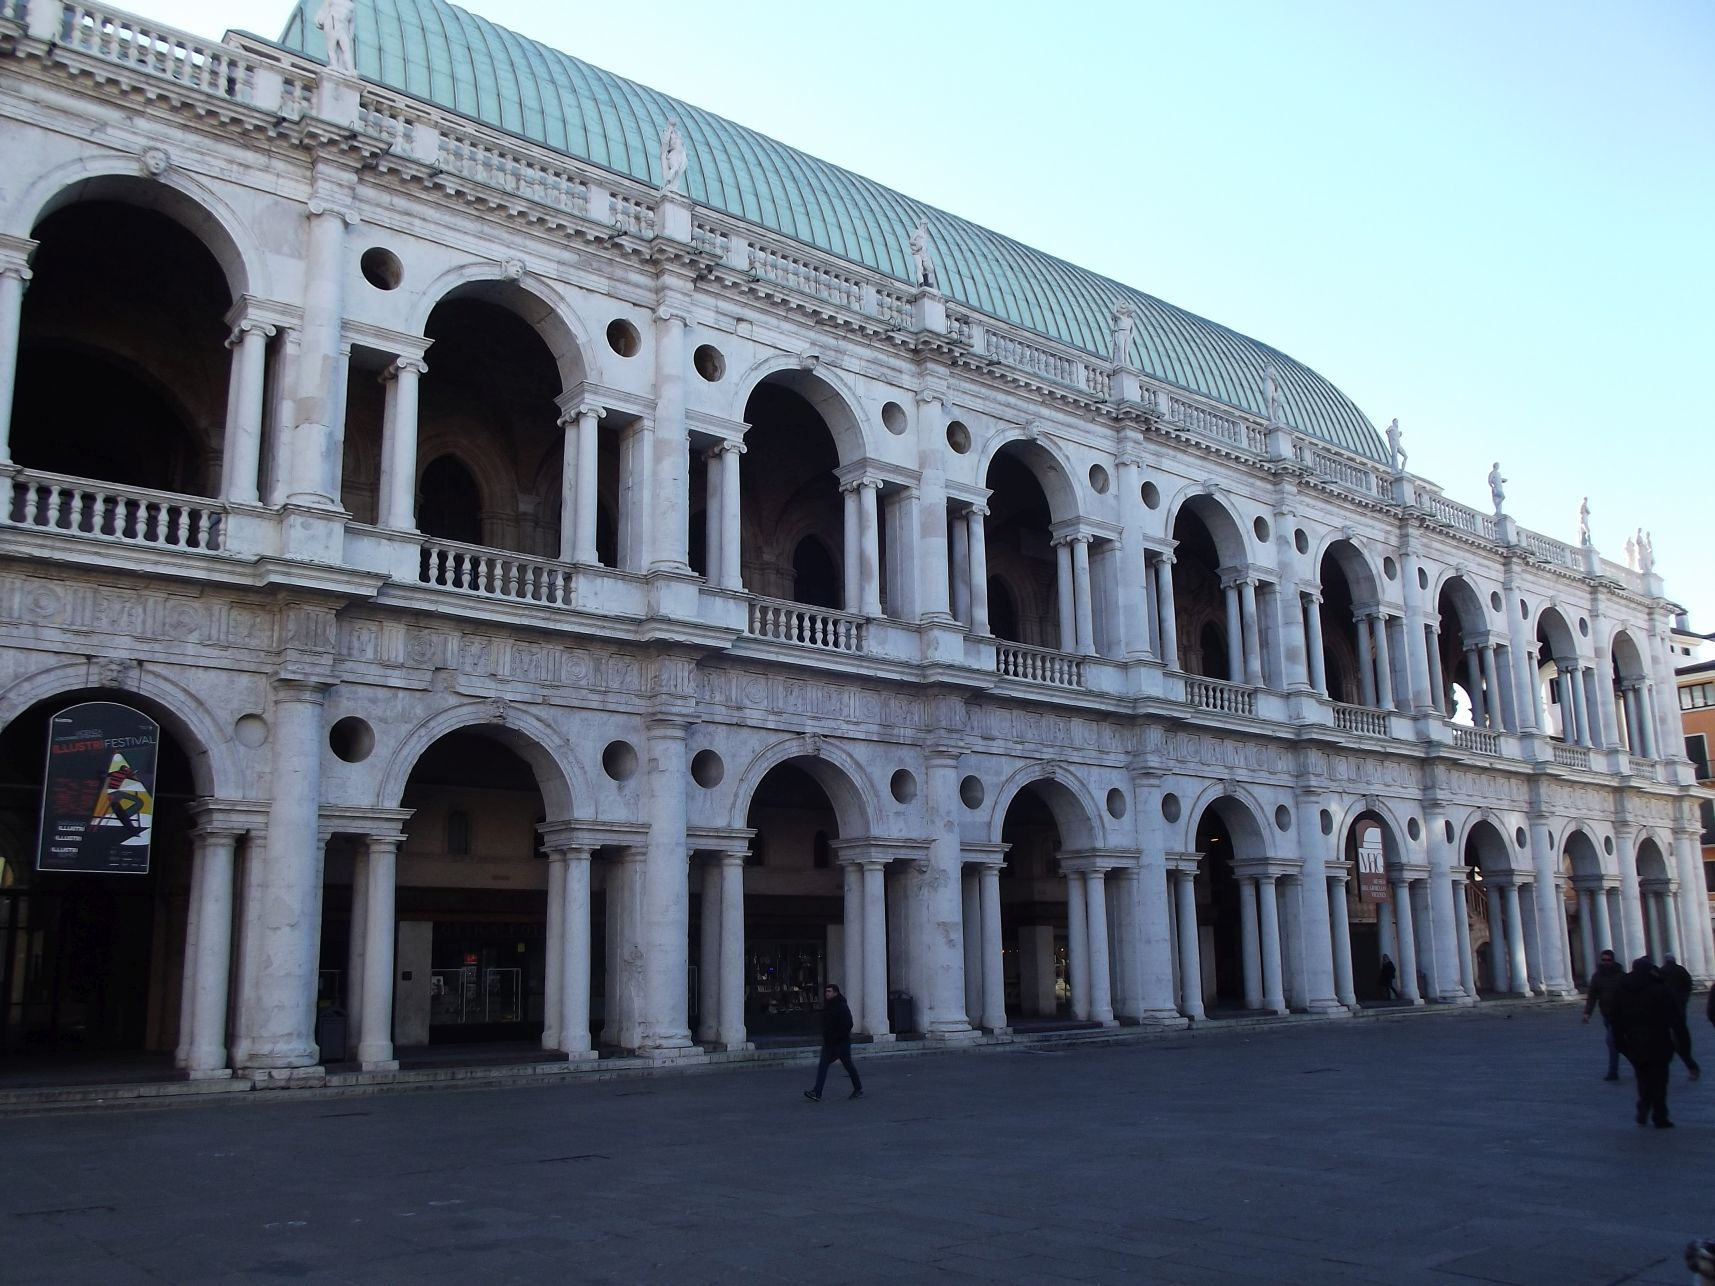 A Basilica Palladiana